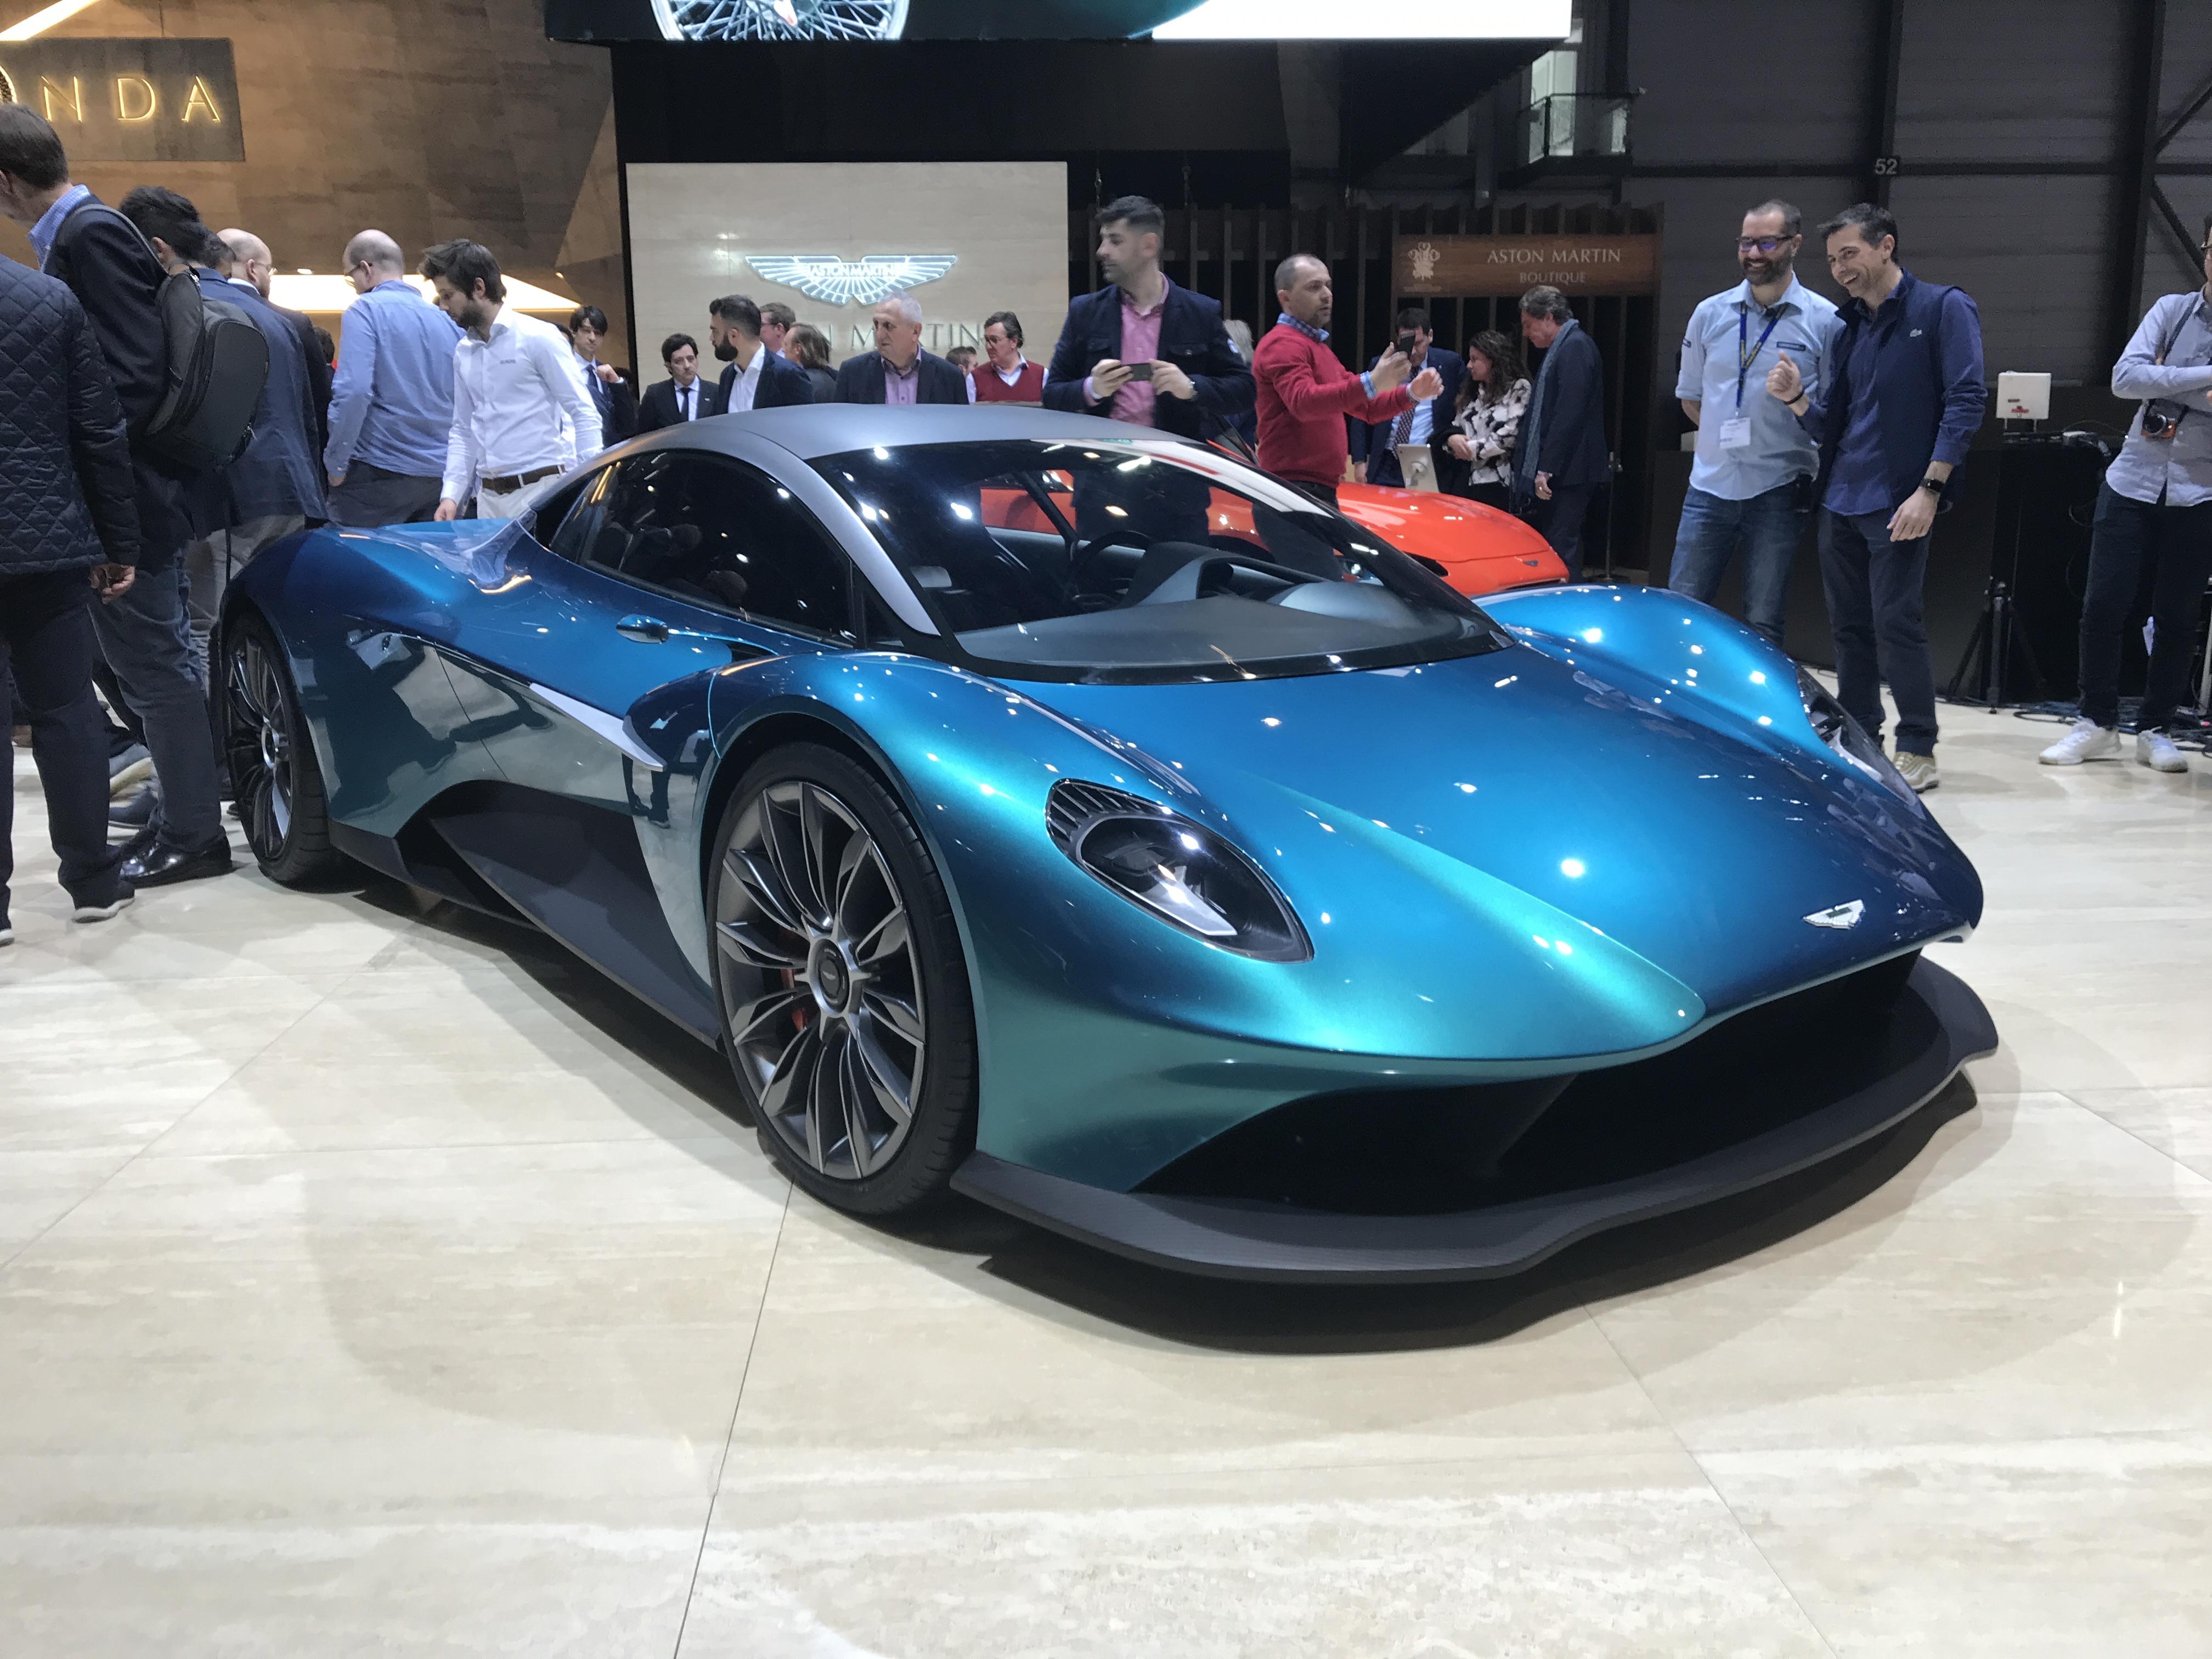 New Aston Martin >> Aston Martin Vanquish Vision Concept Takes Nameplate To New Mid